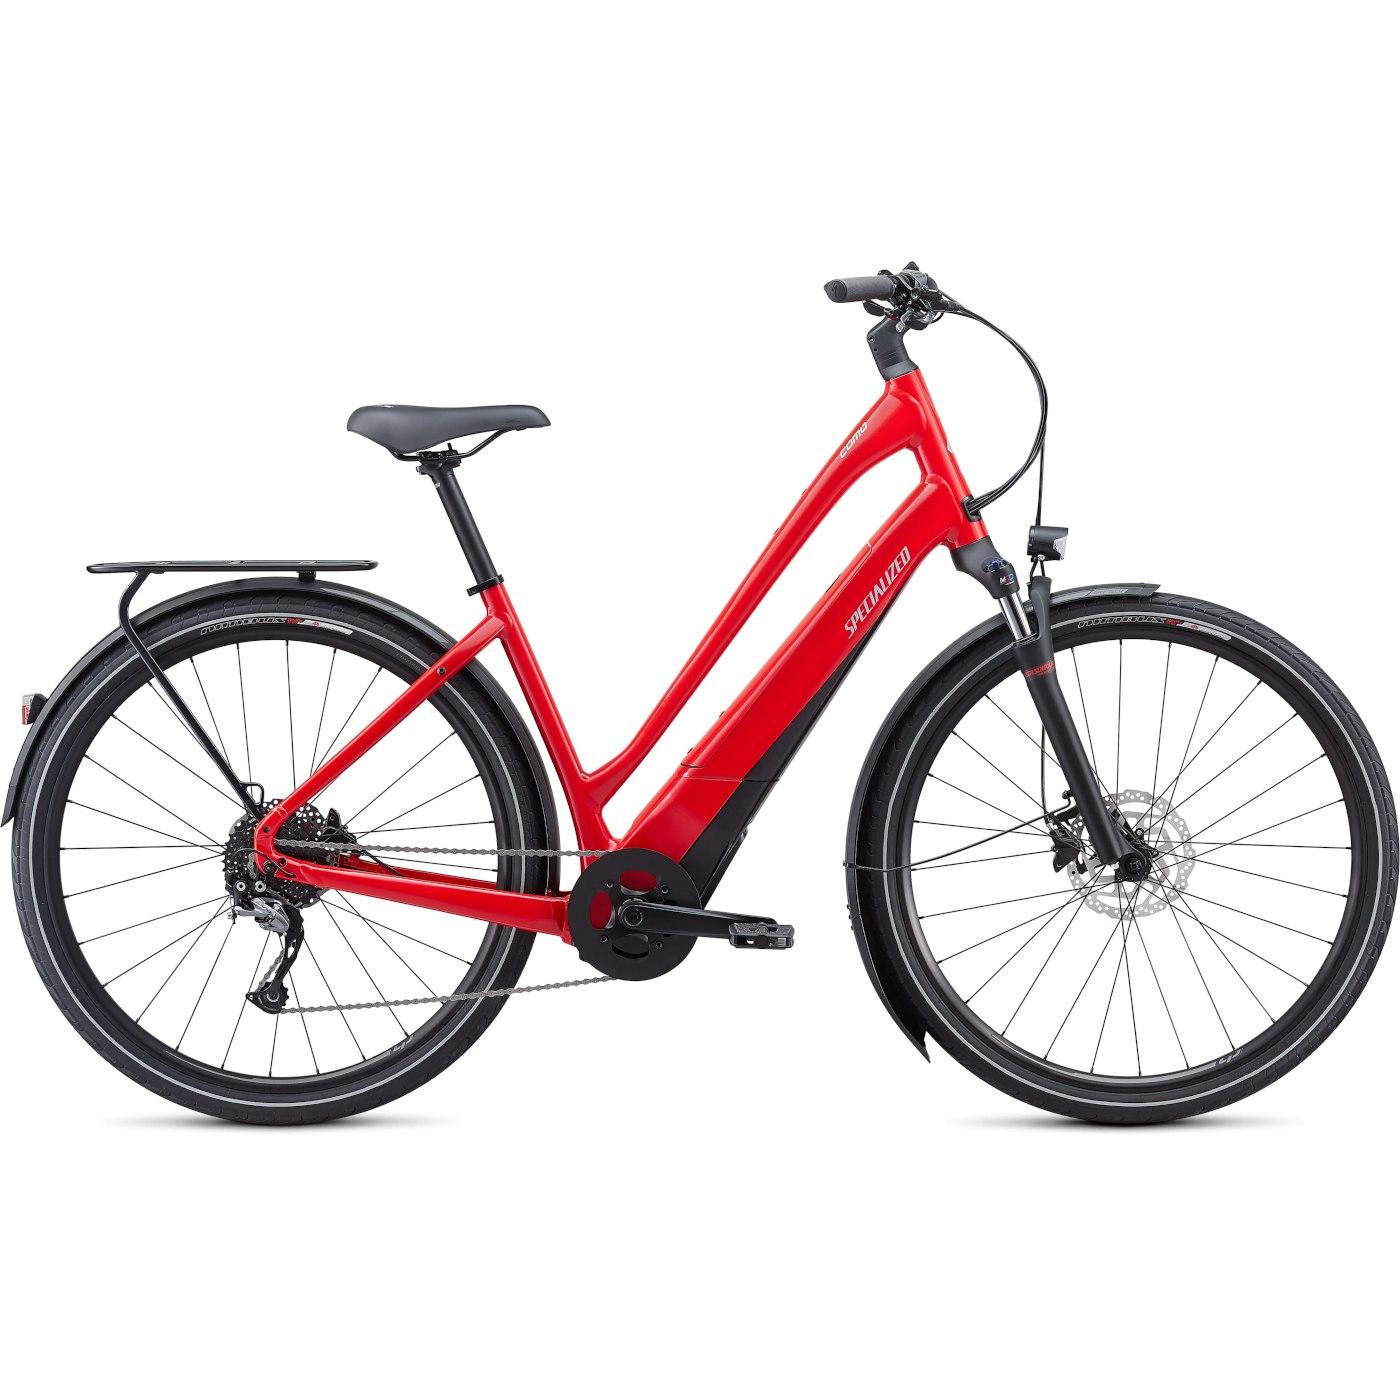 Produktbild von Specialized TURBO COMO 3.0 Low Entry E-Bike - 2021 - flo red / blue ghost pearl / black / chrome